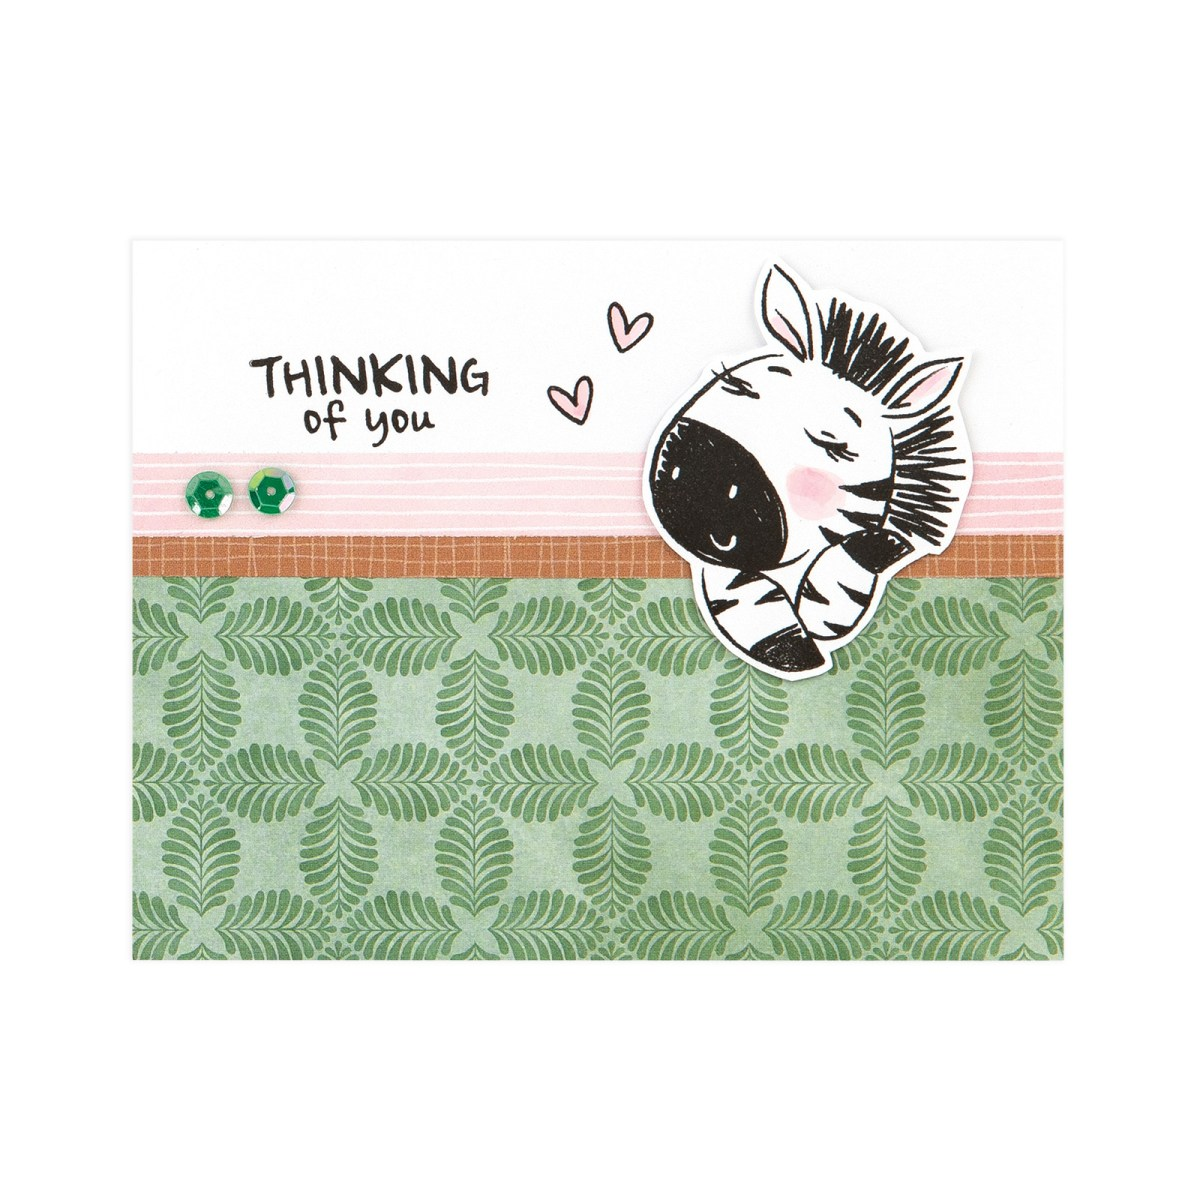 National Scrapbooking Day #closetomyheart #ctmh #nsd #ctmhnsd #nationalscrapbookingday #closetomyheartnsd #closetomyheartnationalscrapbookingday #sendingyouhugs #cardmaking #cardmakingworkshop